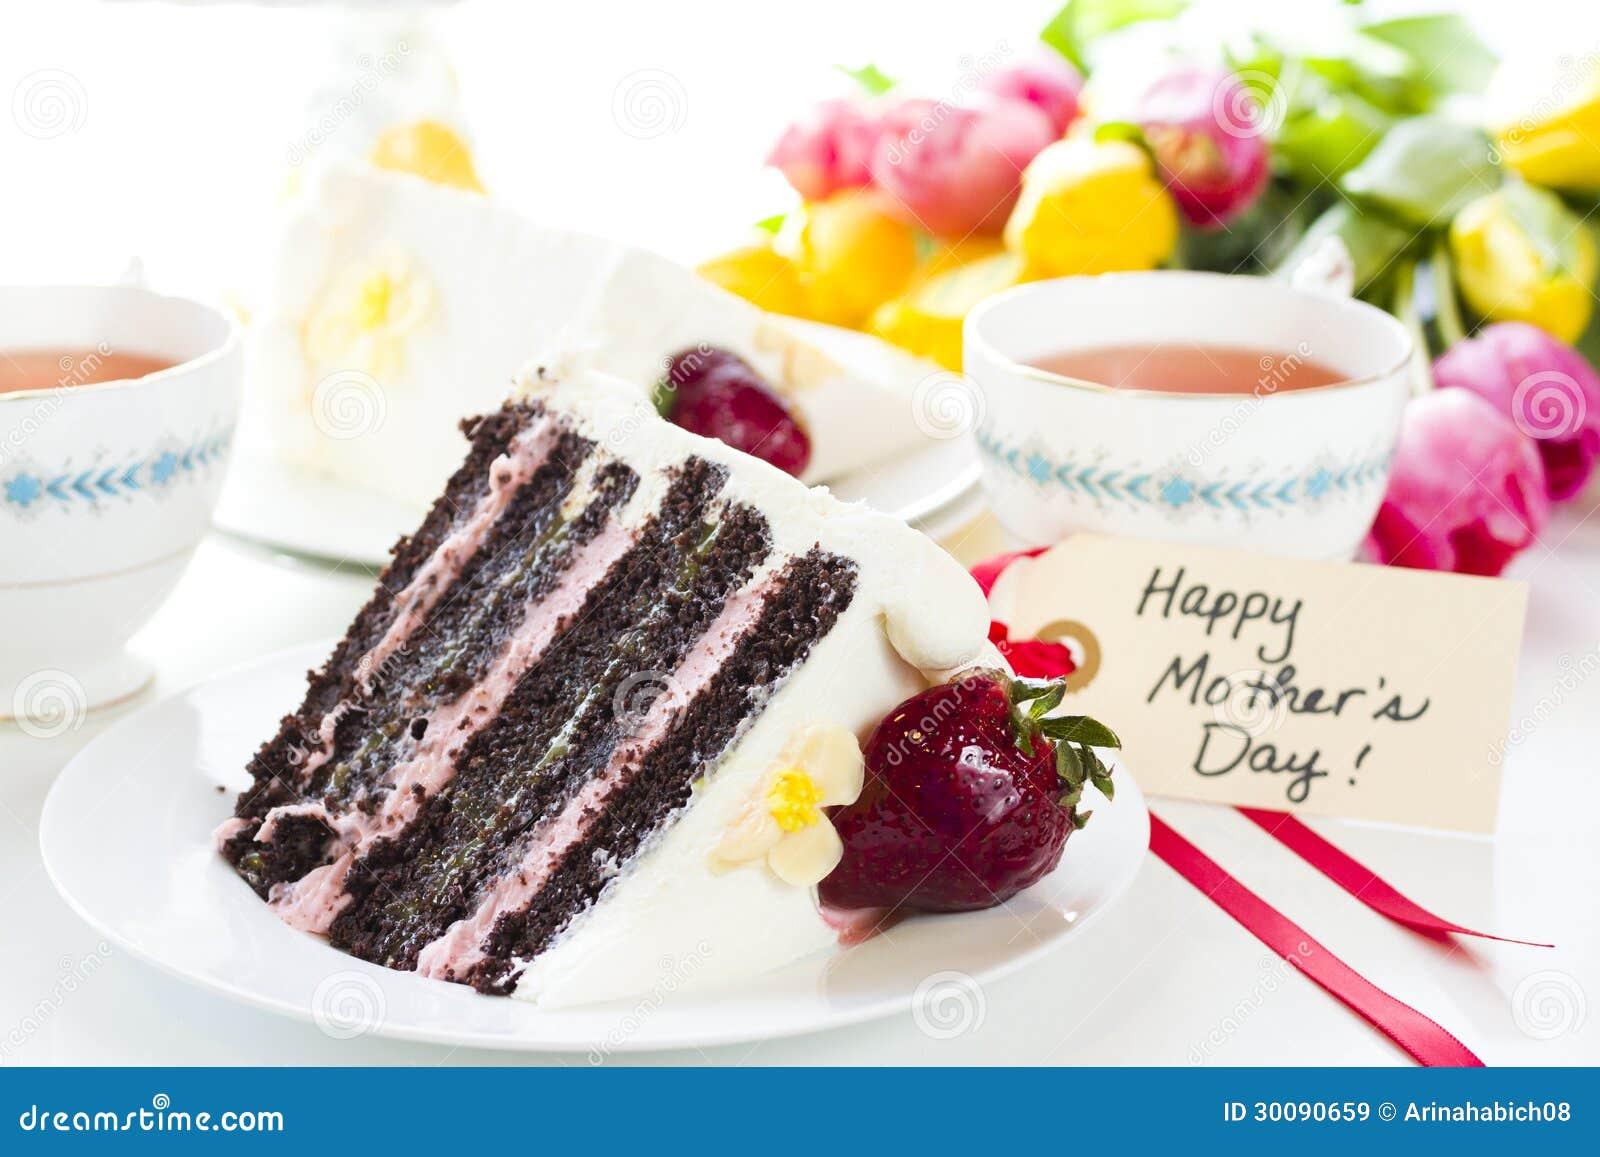 Chocolate Strawberry Lemon Torte Stock Image Image Of Garden